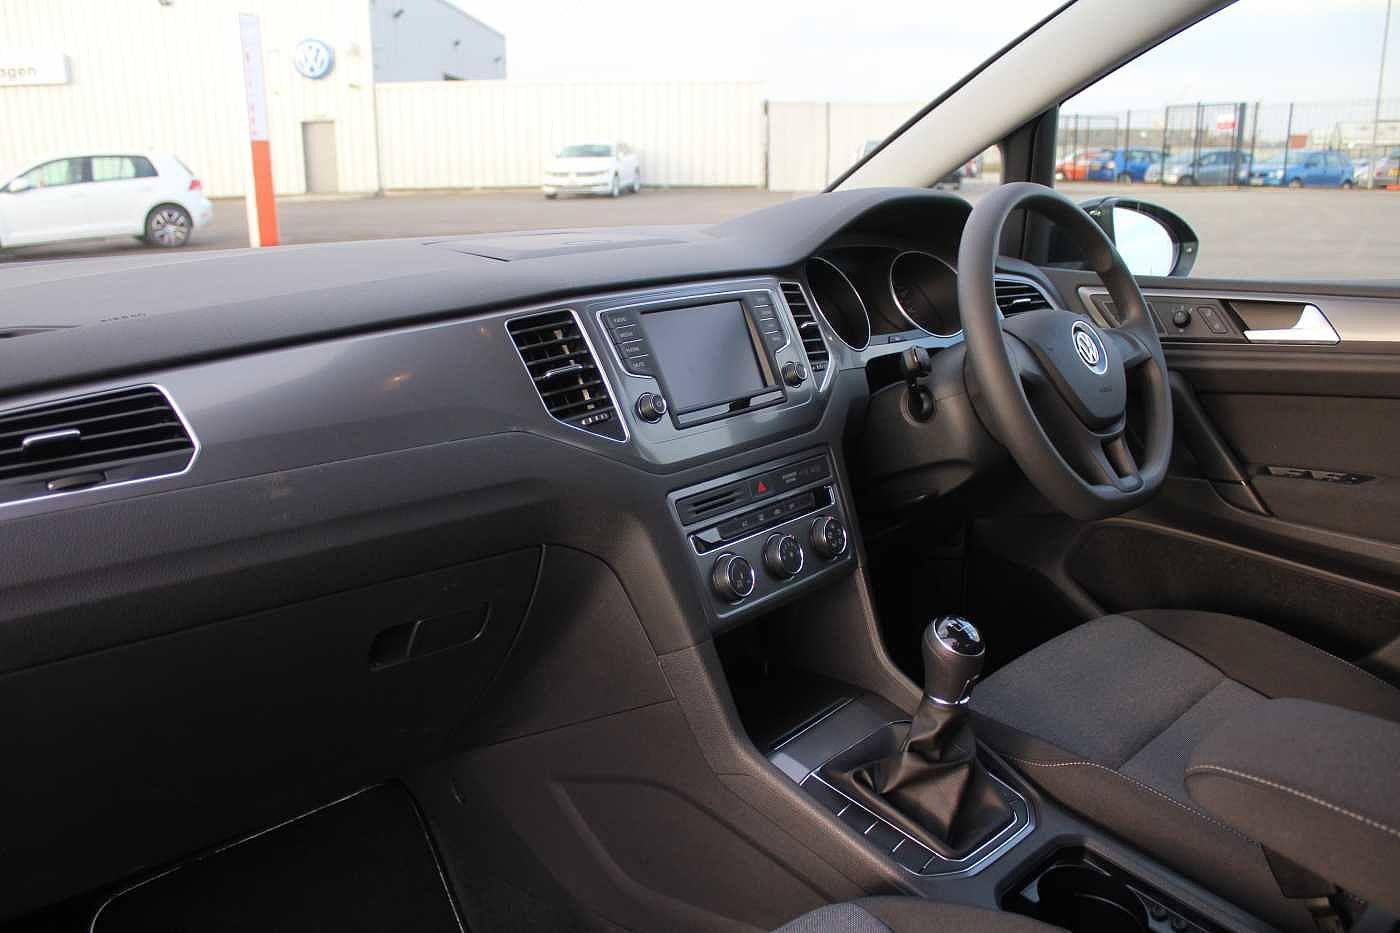 Volkswagen Golf Sv Diesel Hatchback 1.6 TDI 115 S 5dr